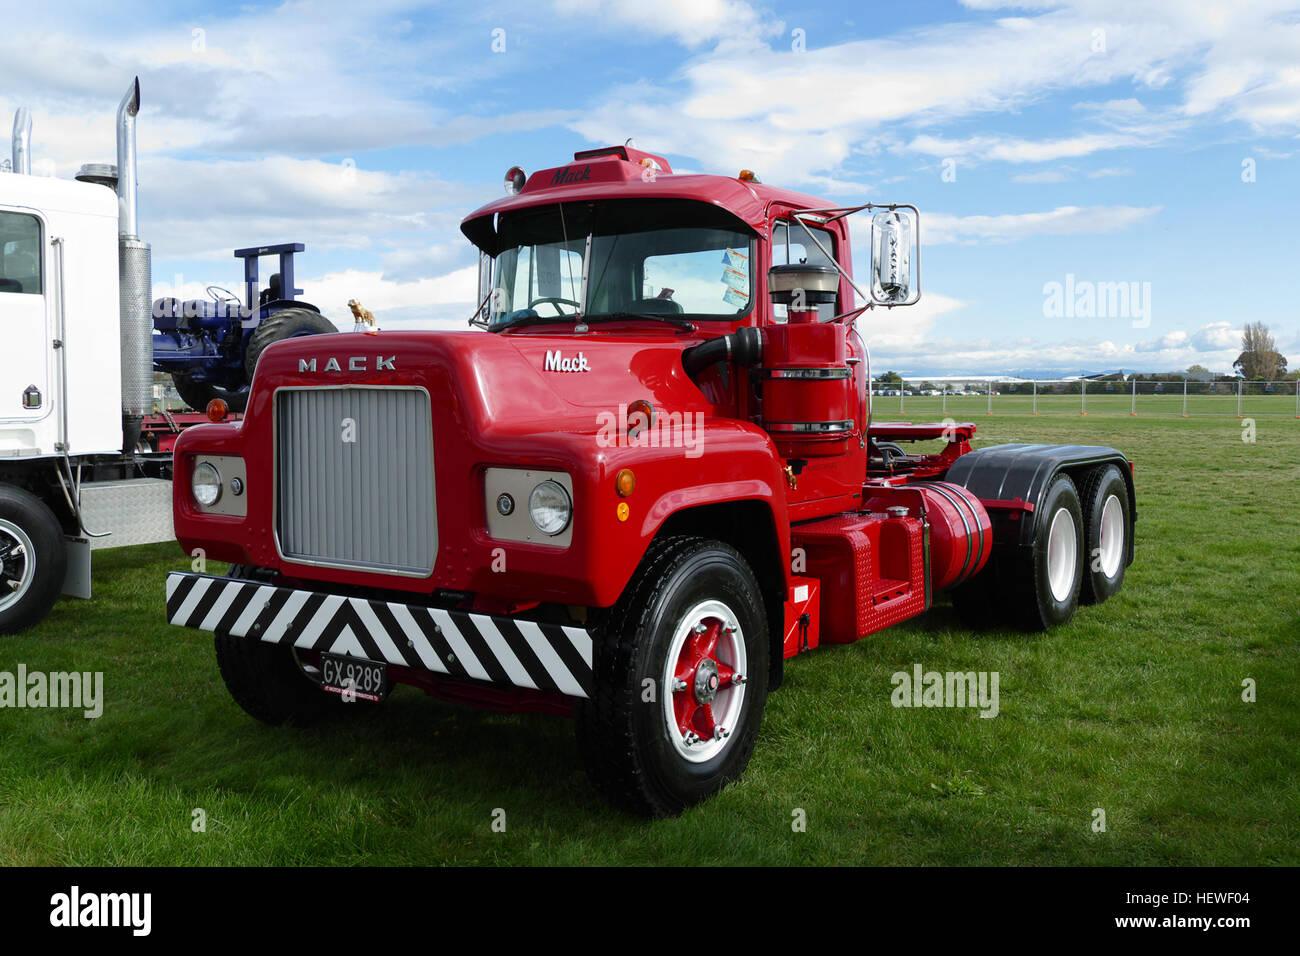 R Model Mack Show Truck : Christchurch truck show the mack r model was a class